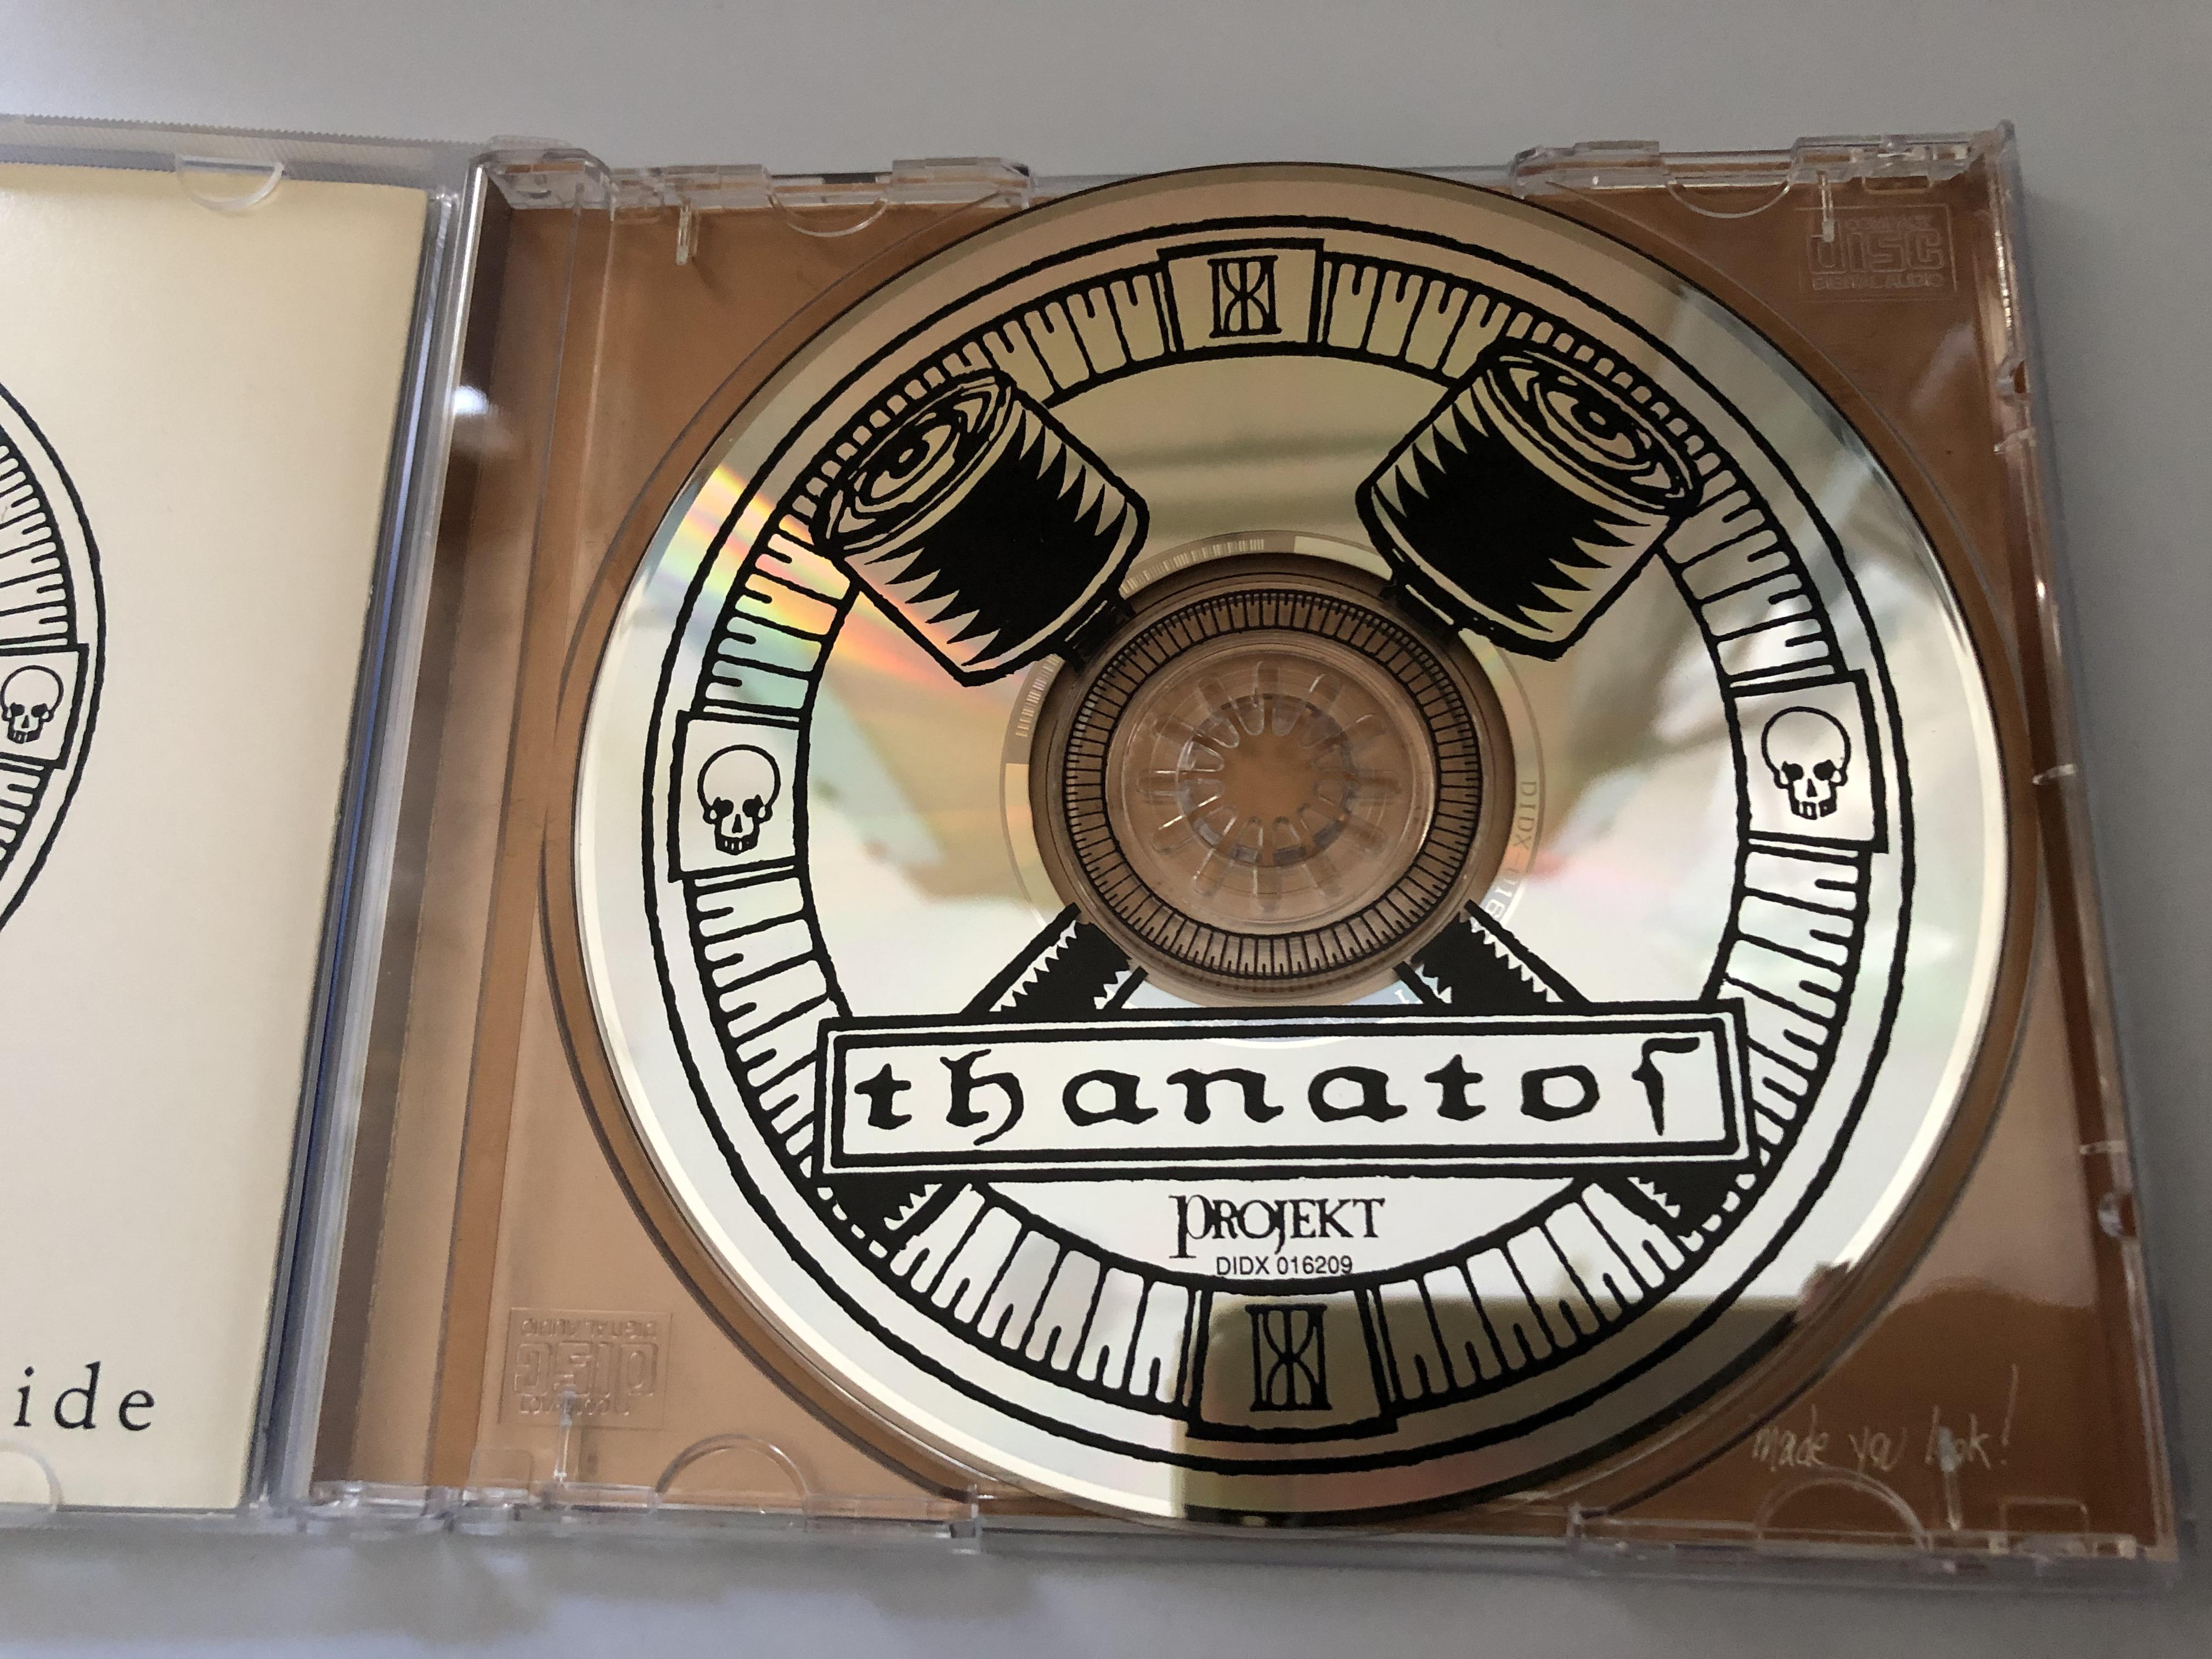 thanatos-this-endless-night-inside-hyperium-records-audio-cd-cd-391-0061-2-42-3-.jpg